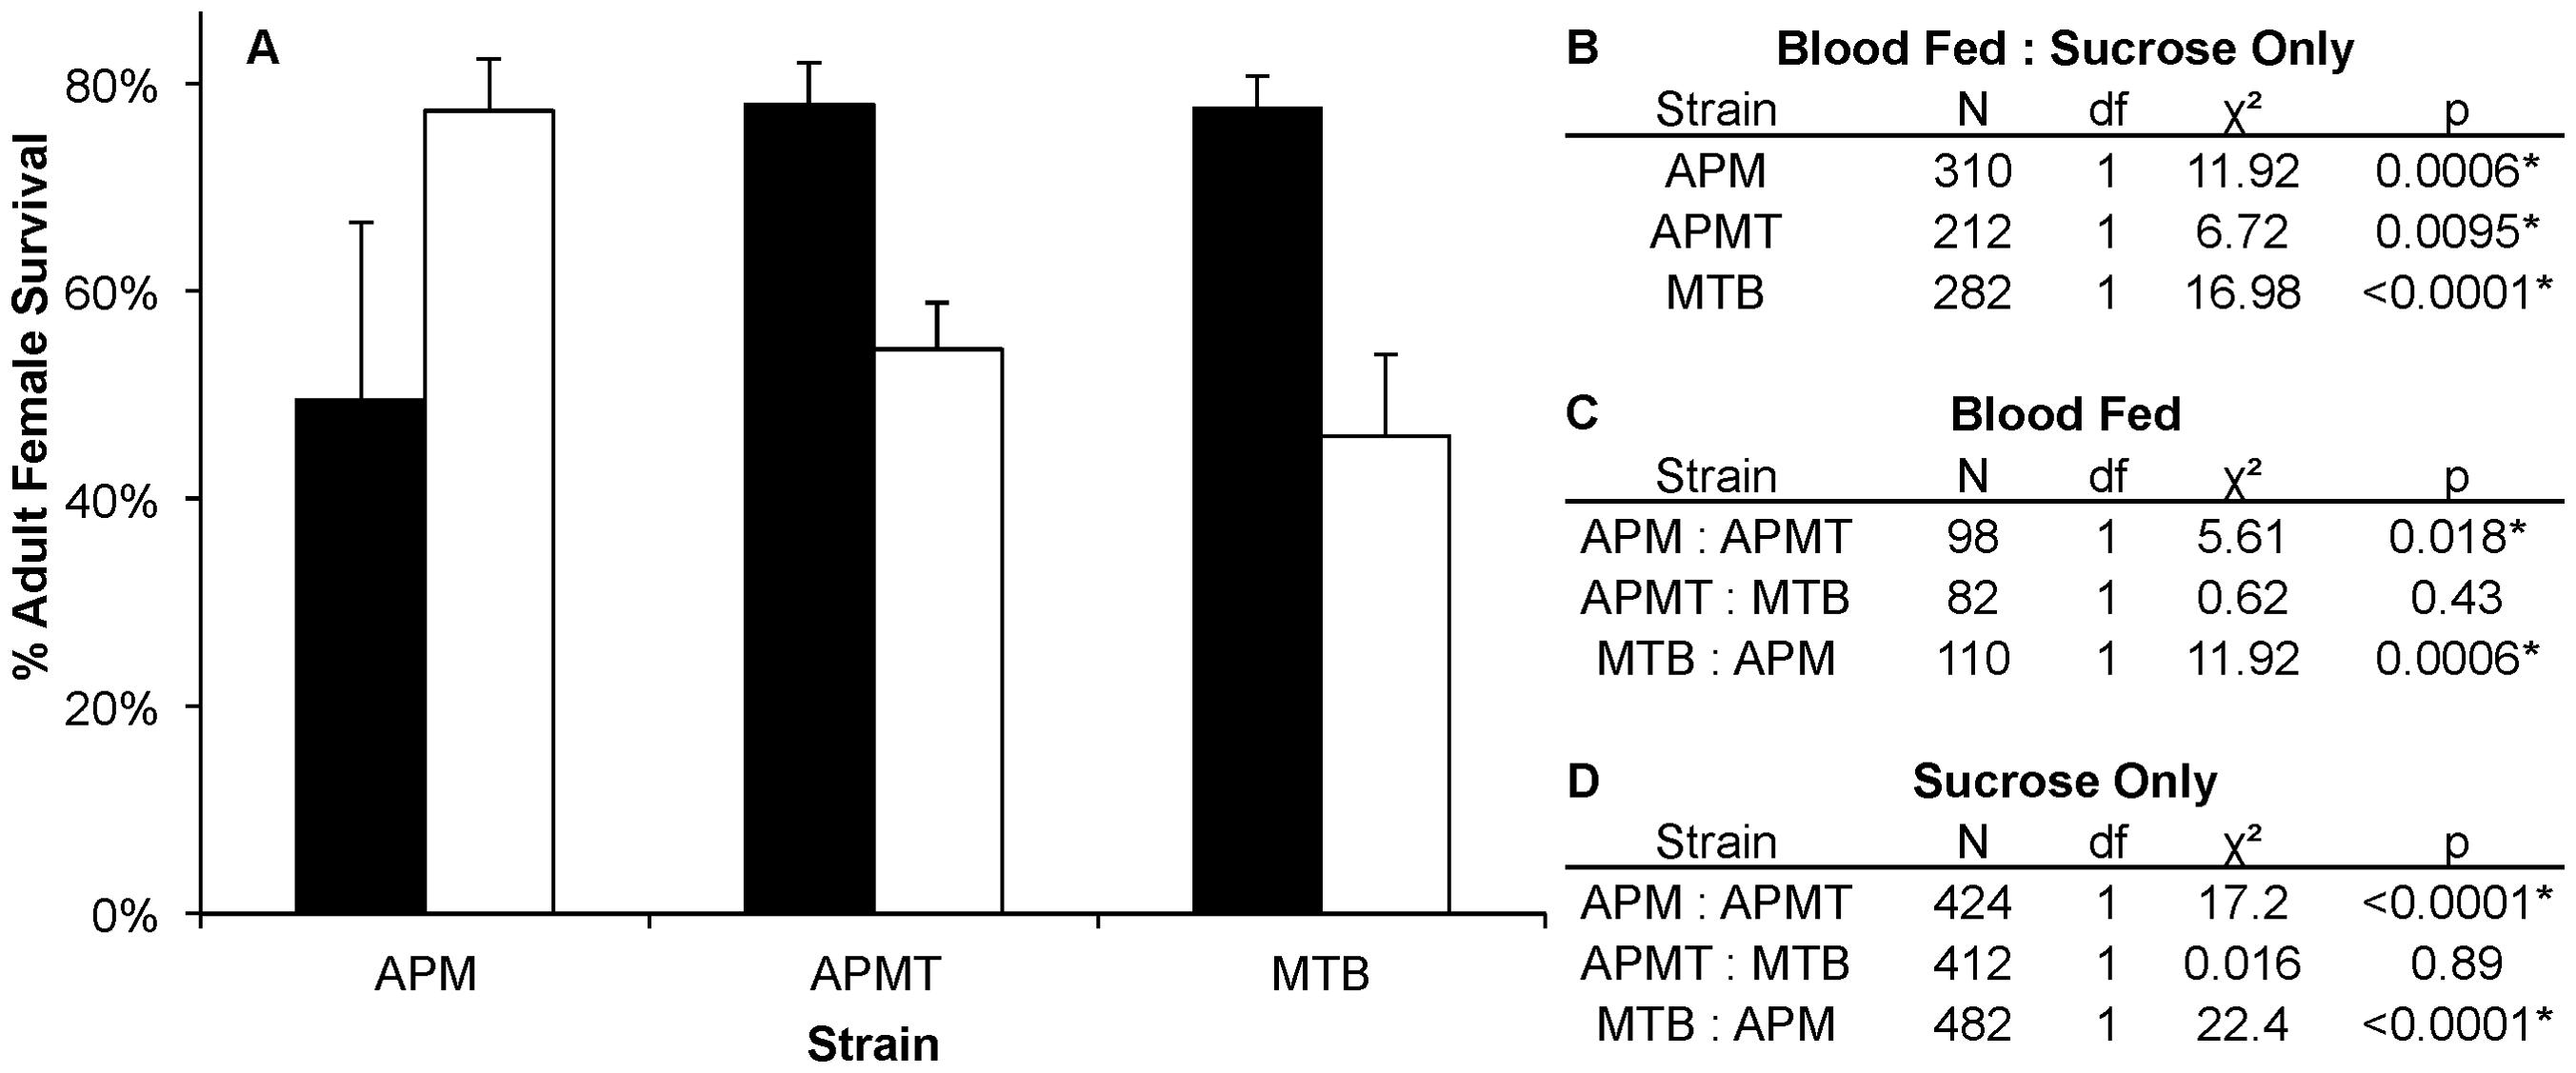 Survivorship of <i>Ae. polynesiensis</i> strains after blood feeding vs. sucrose only.